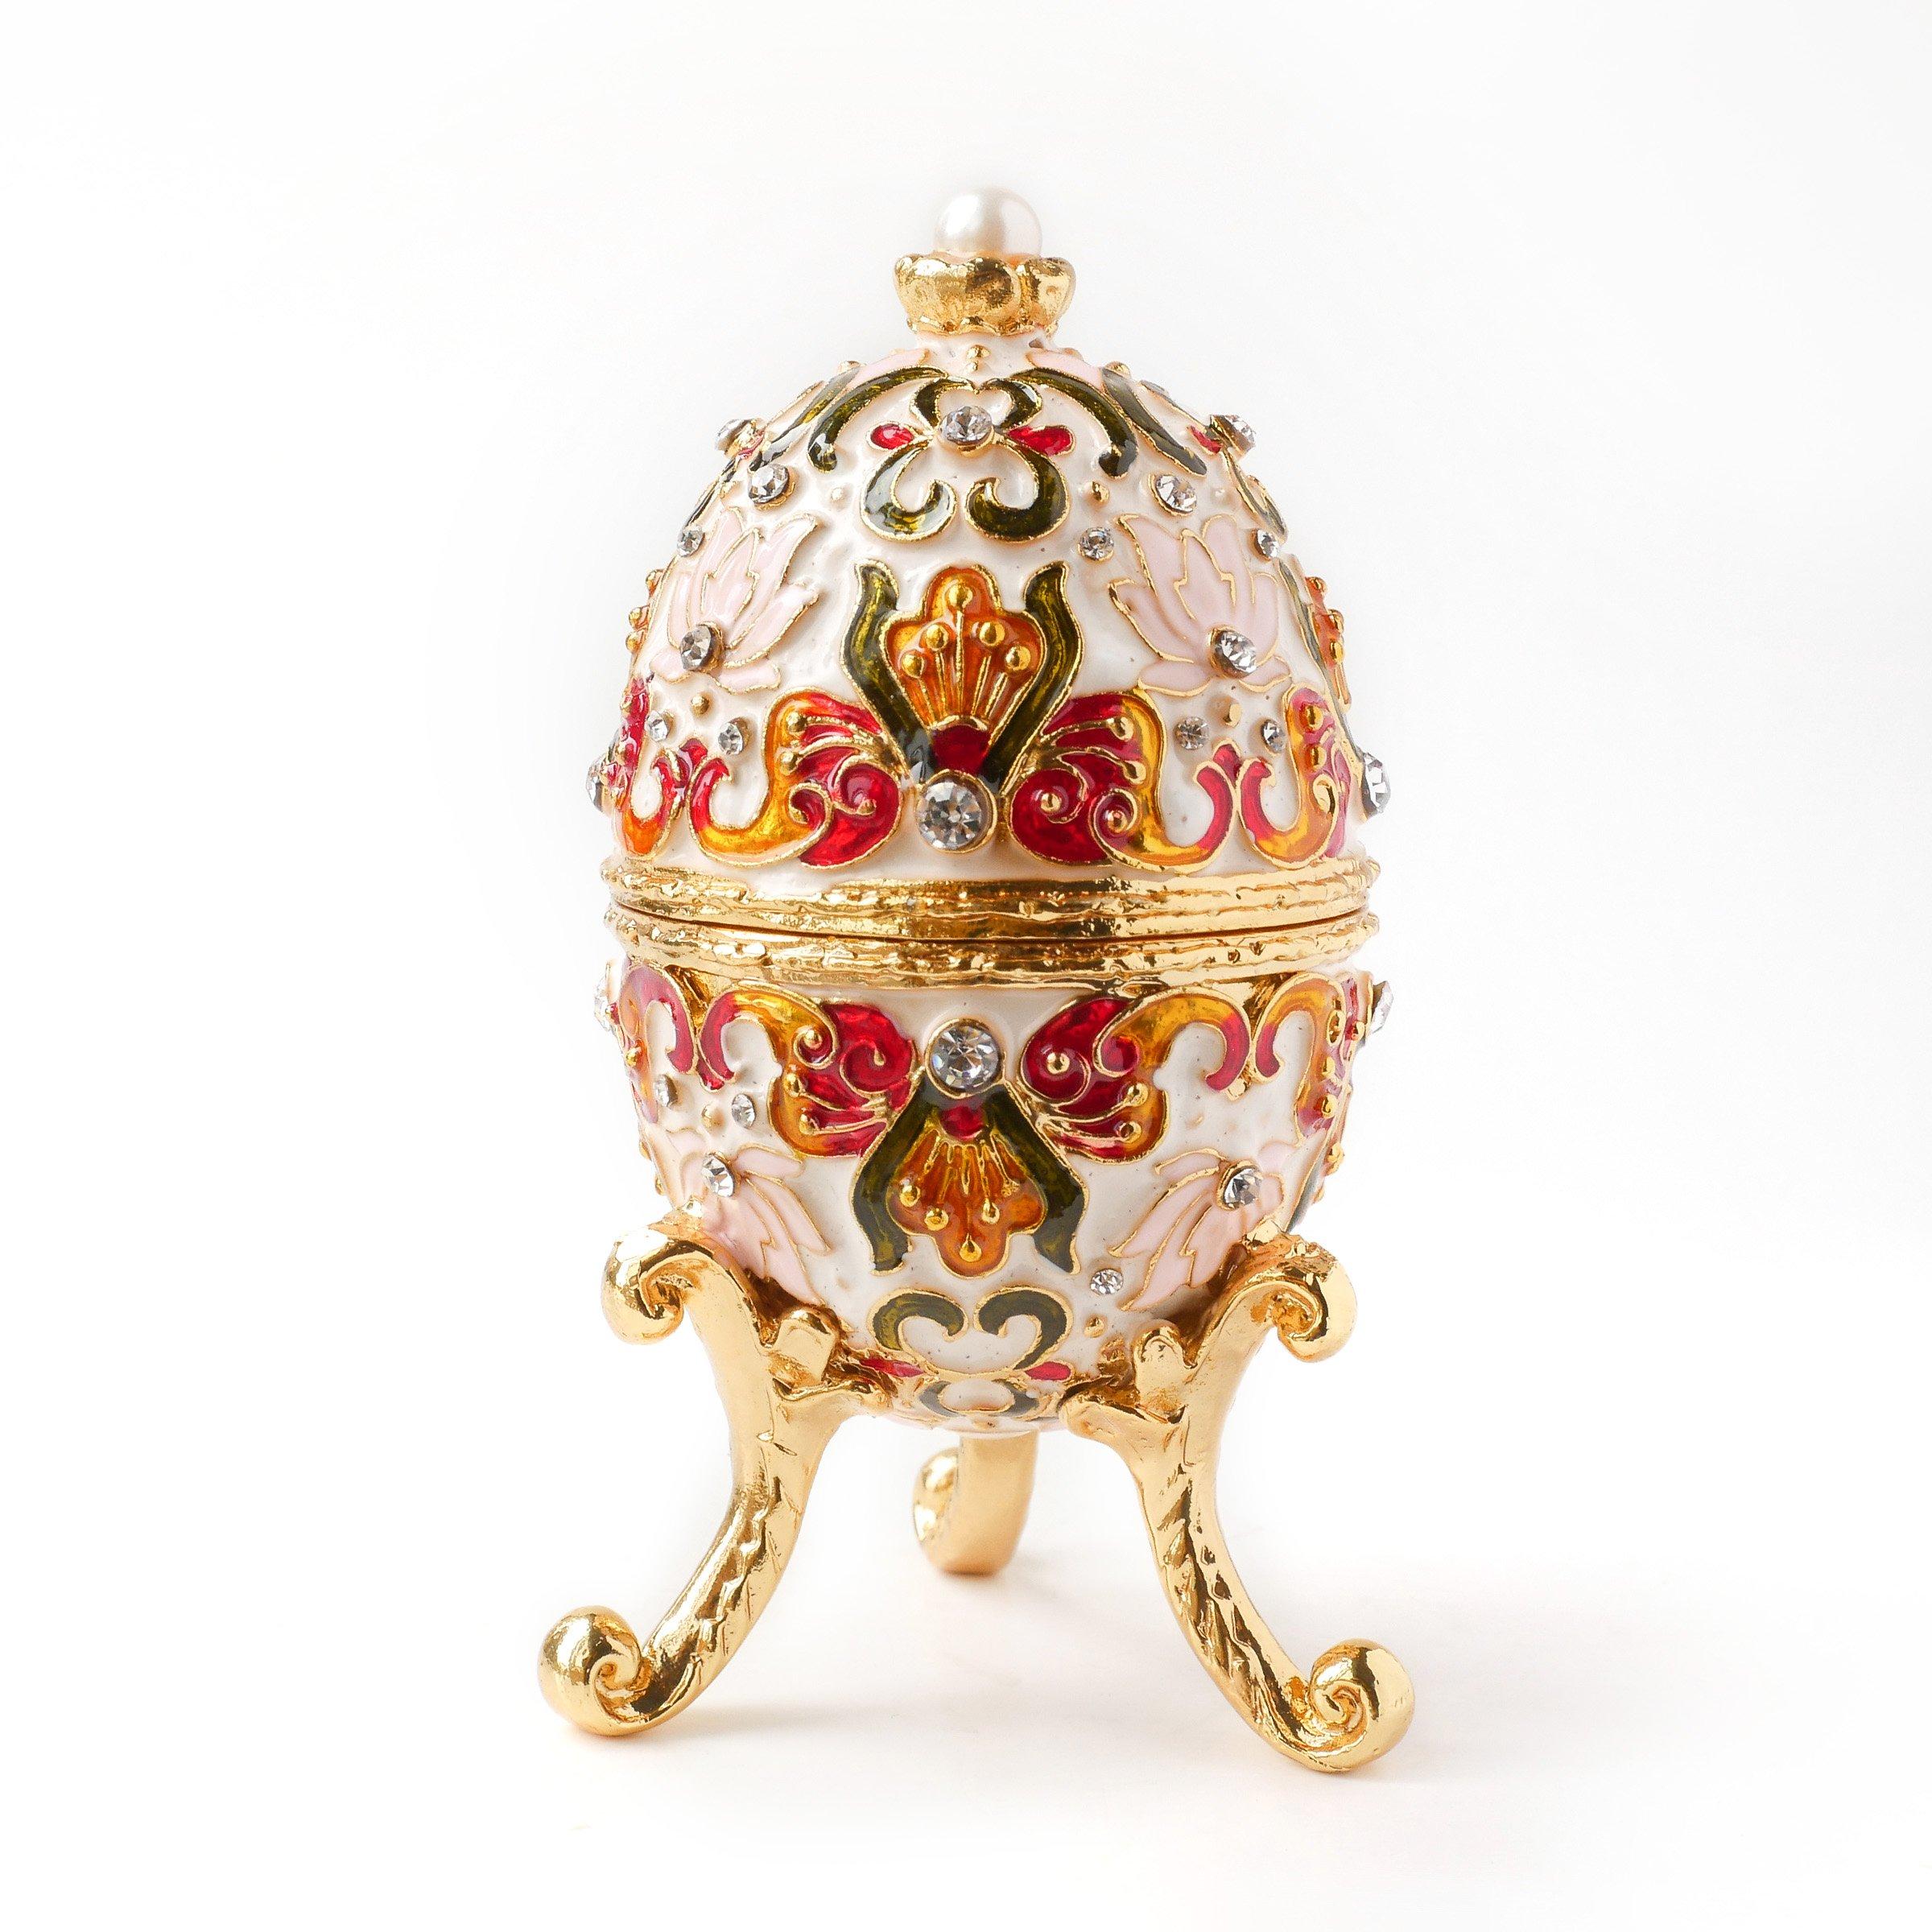 Faberge Egg w Rich Enamel /& Sparkling Rhinestones Jewelry Trinket Box Royal Red